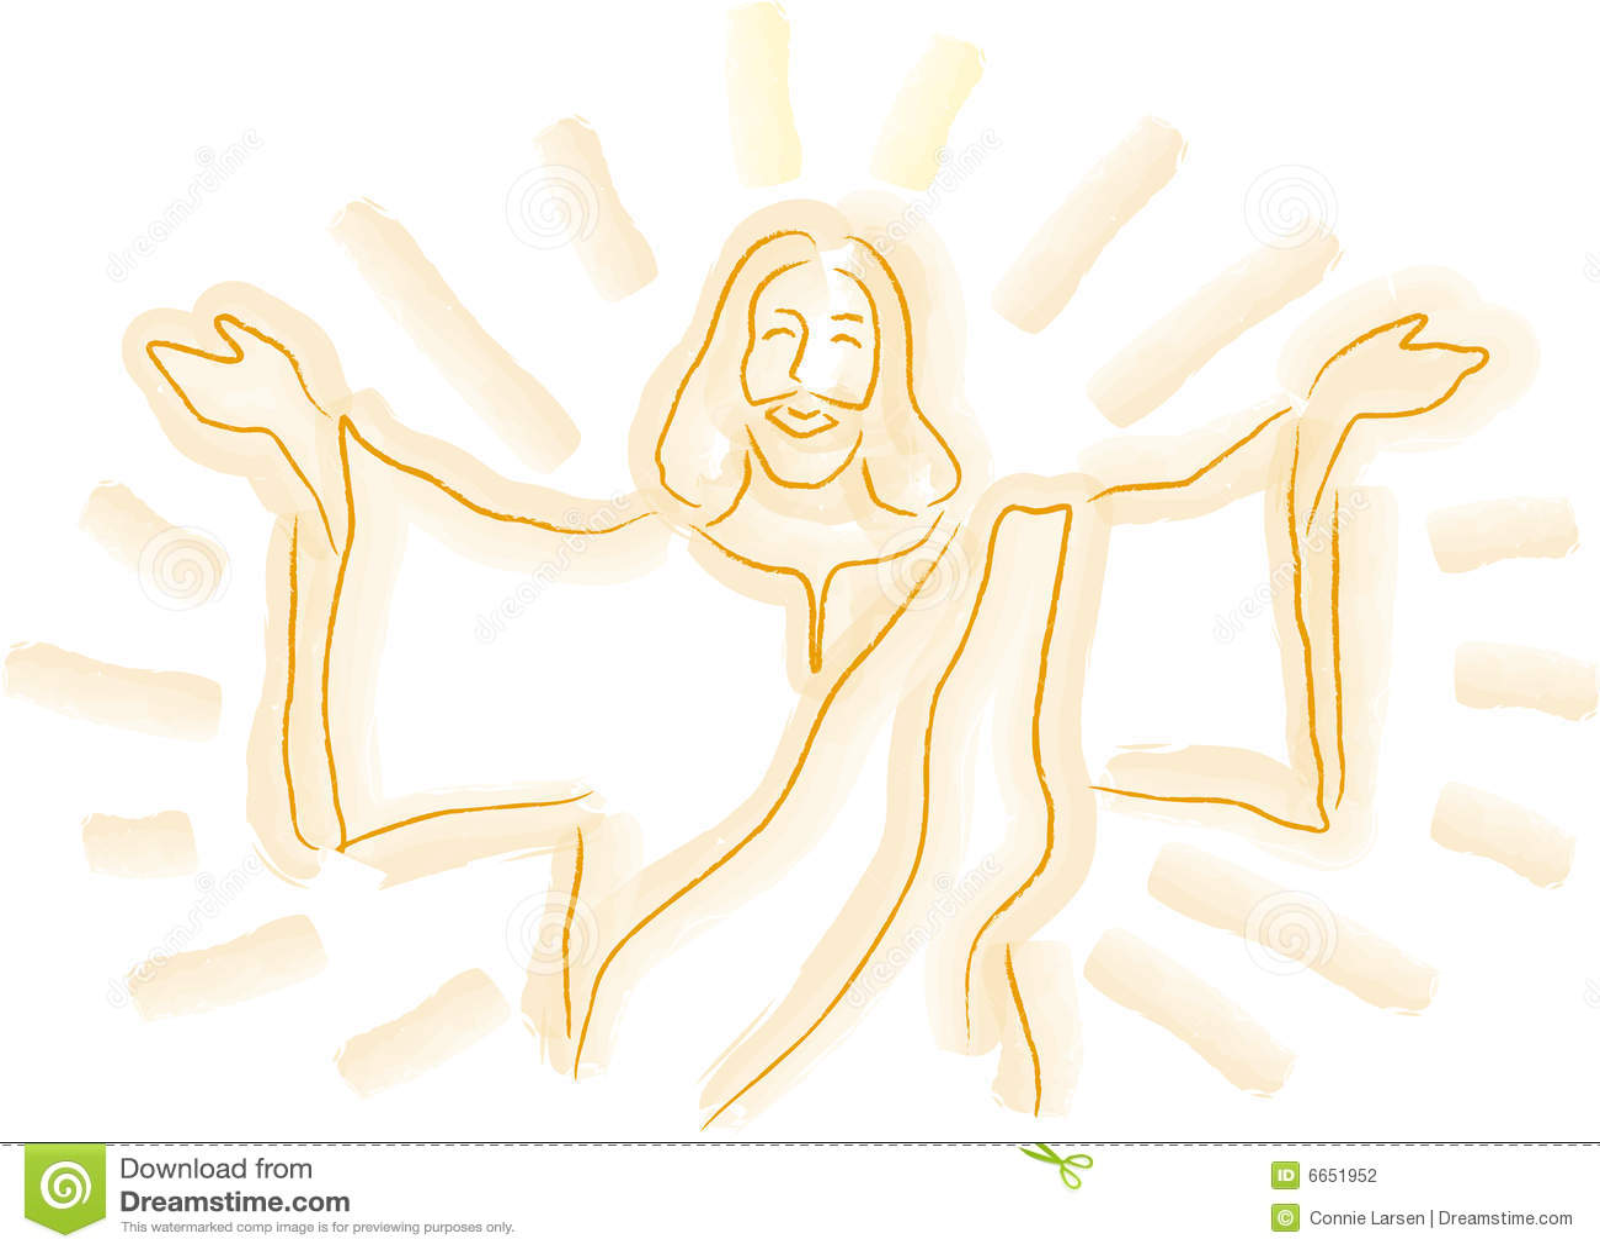 Esboco De Jesus Ilustracao Stock Ilustracao De Grafico 6651952